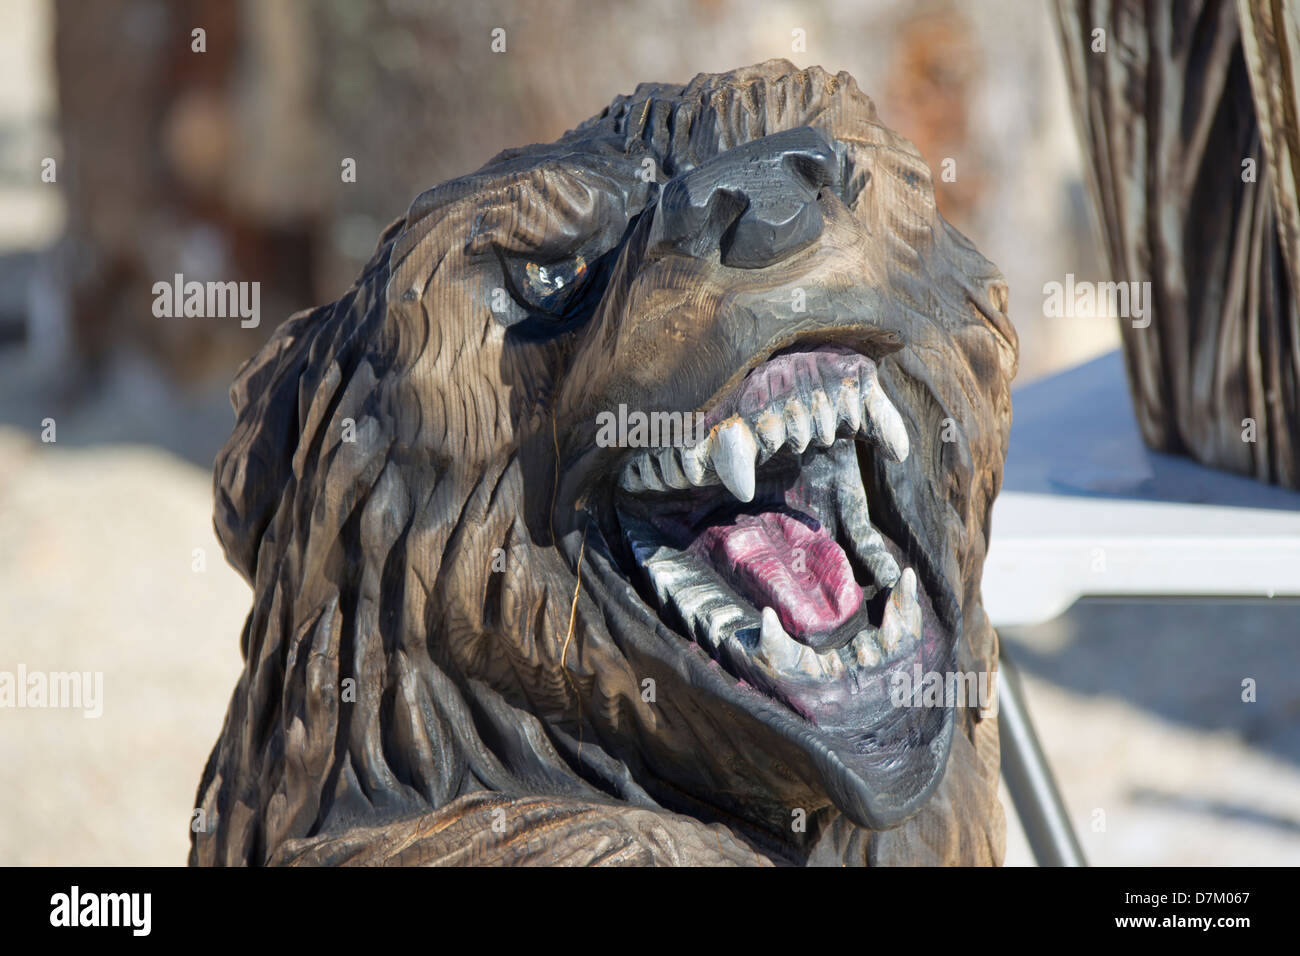 Chainsaw carving stockfotos bilder alamy